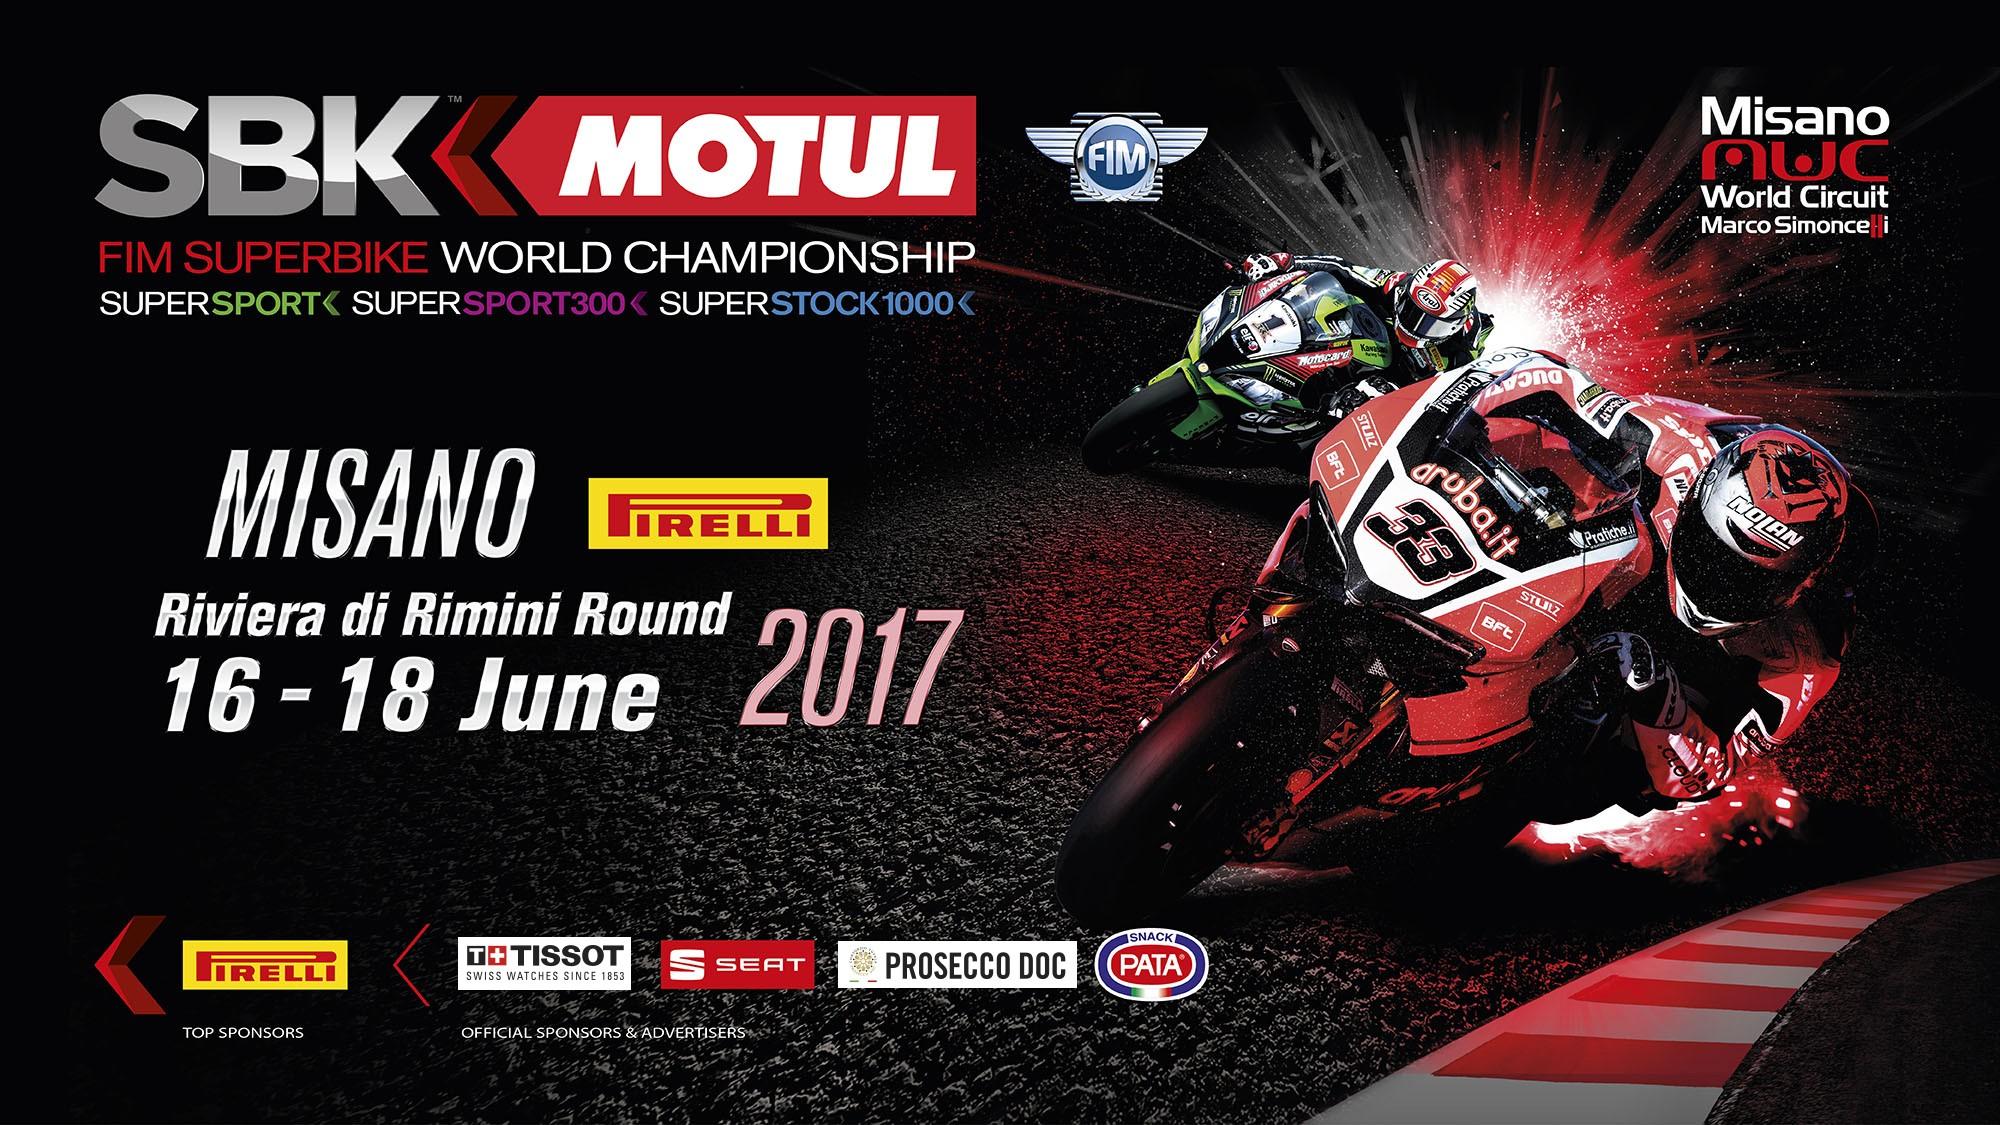 Supersport FIM World Championship 2017 - page 2 - Non